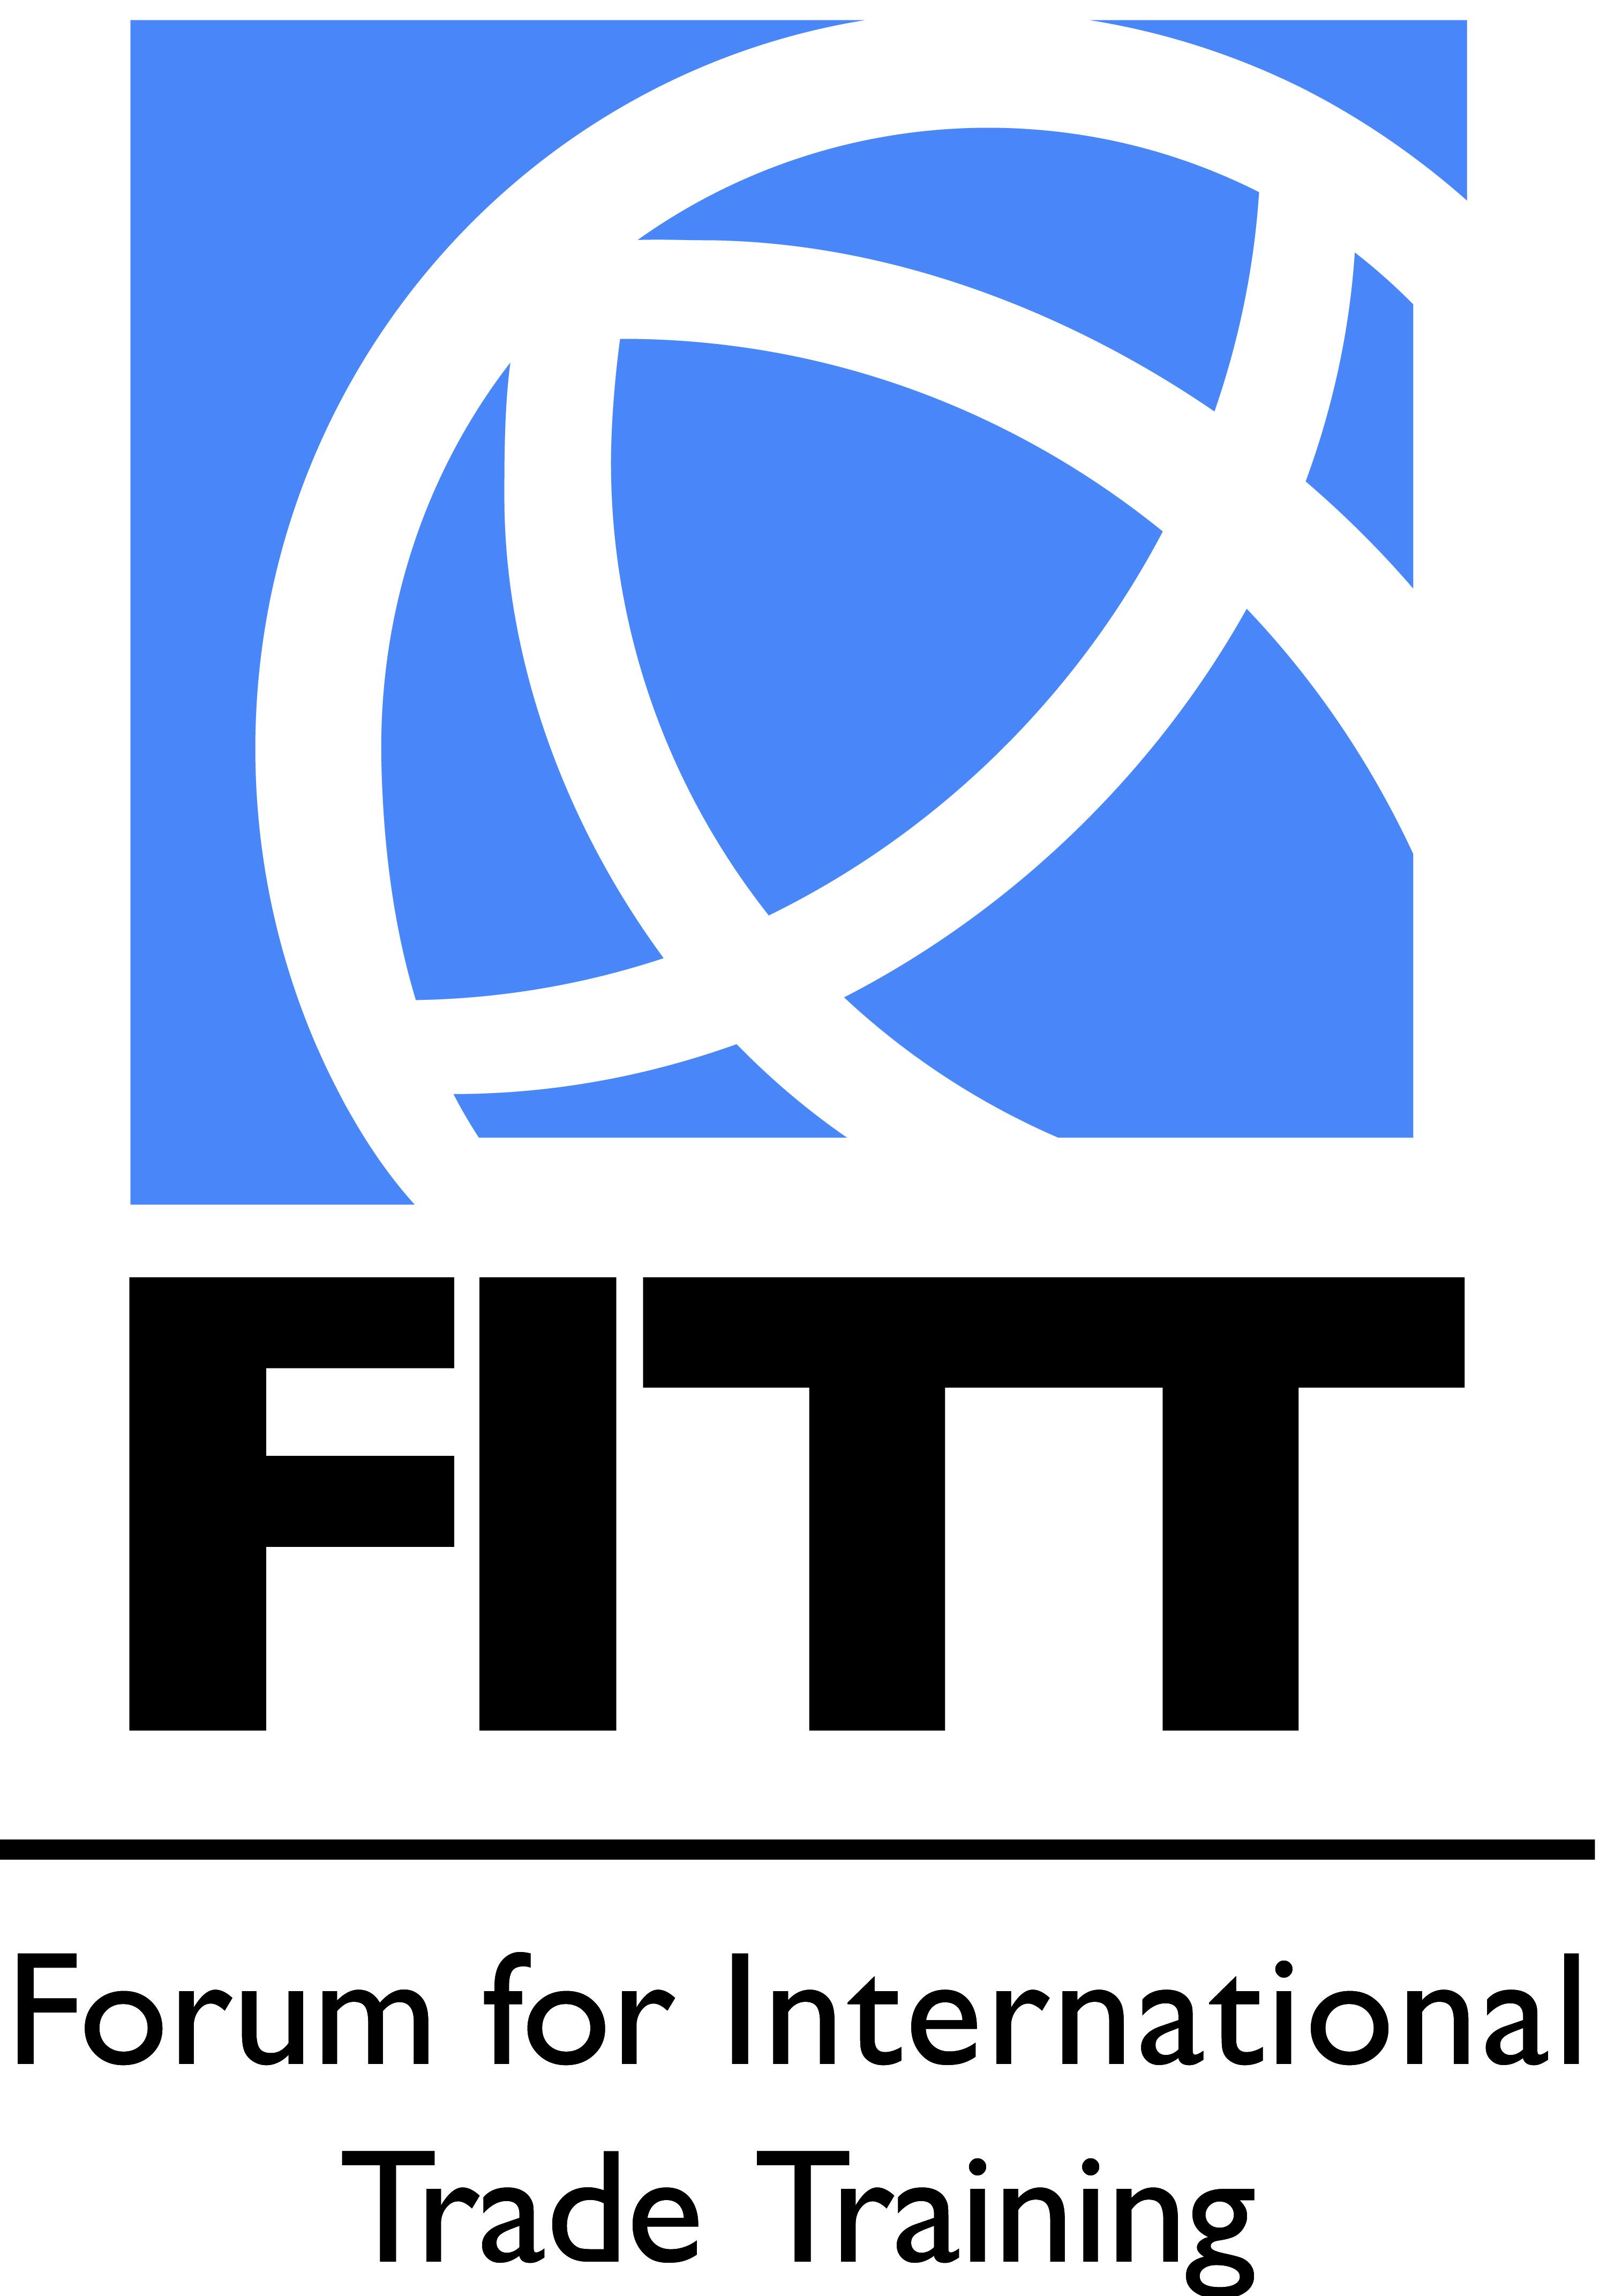 Digital Marketing Specialist – Forum for International Trade Training